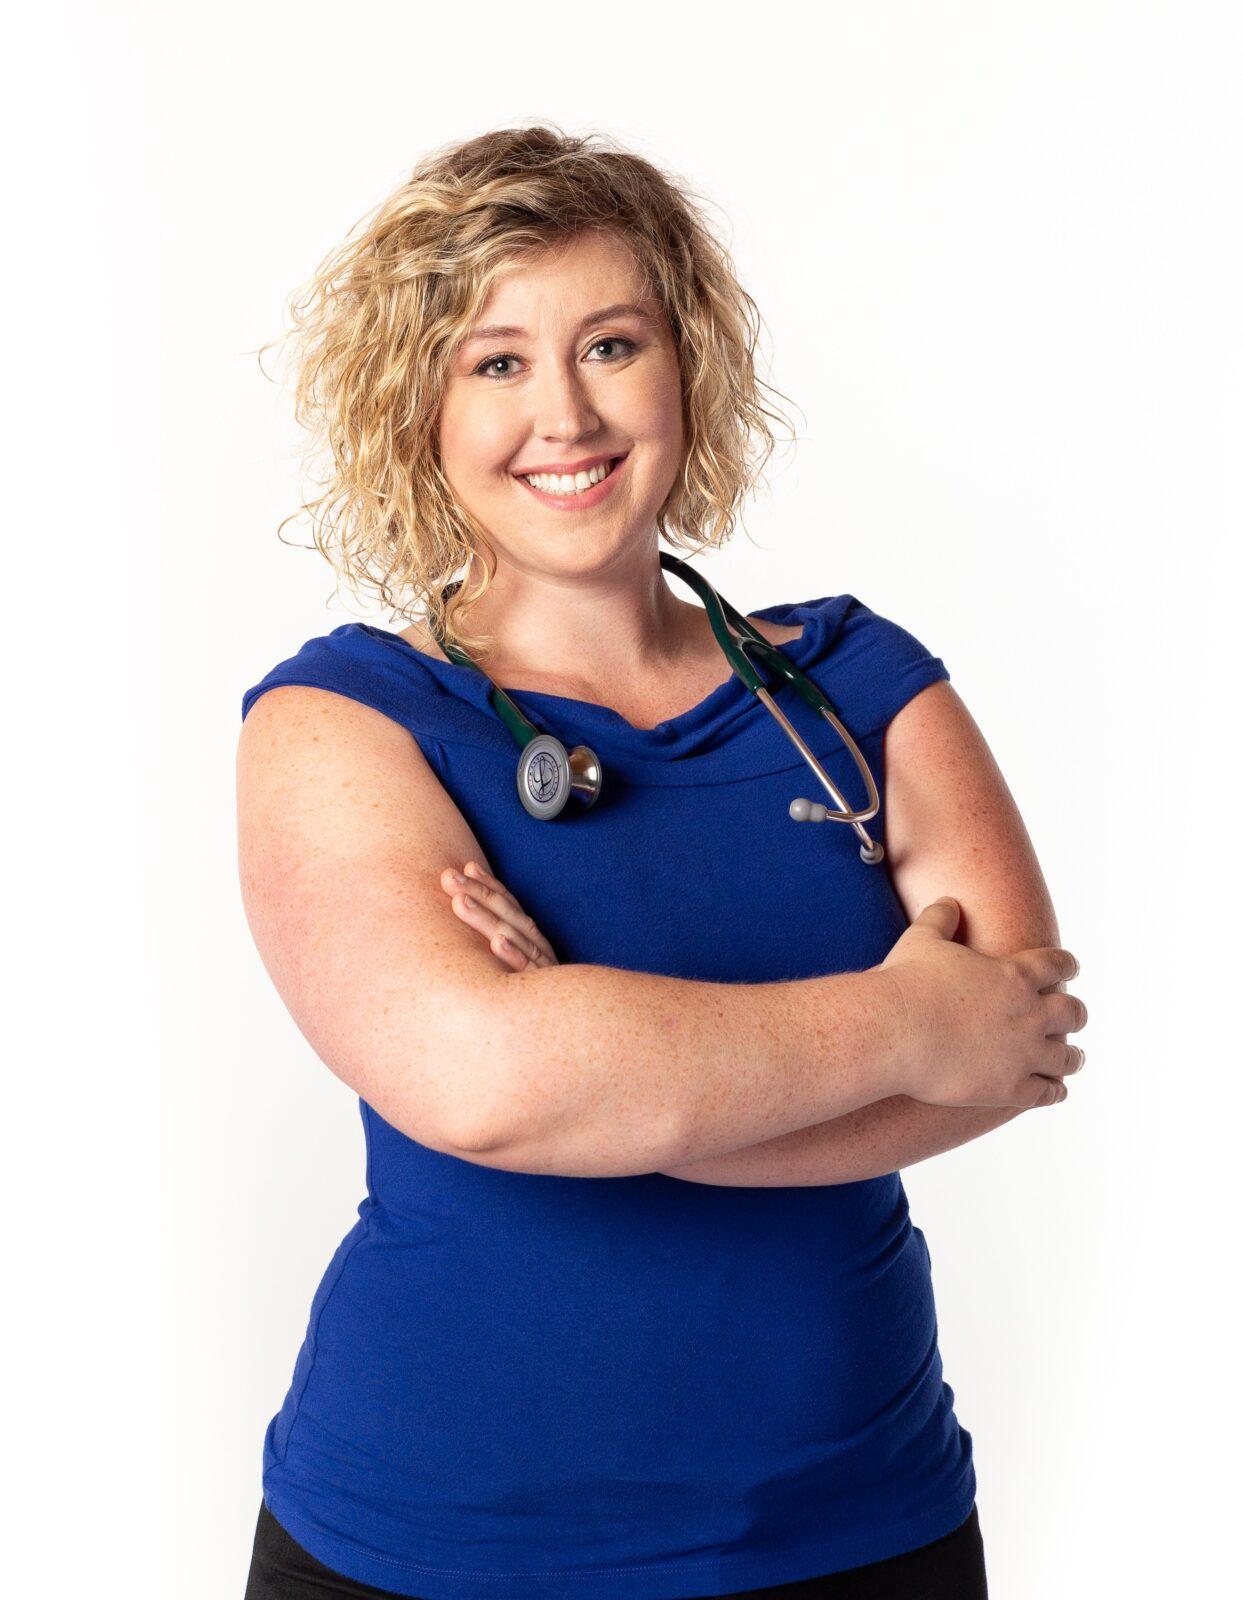 Dr. Heather van Der Geest, Naturopathic Doctor, Naturopath, Sports Medicine, Injections